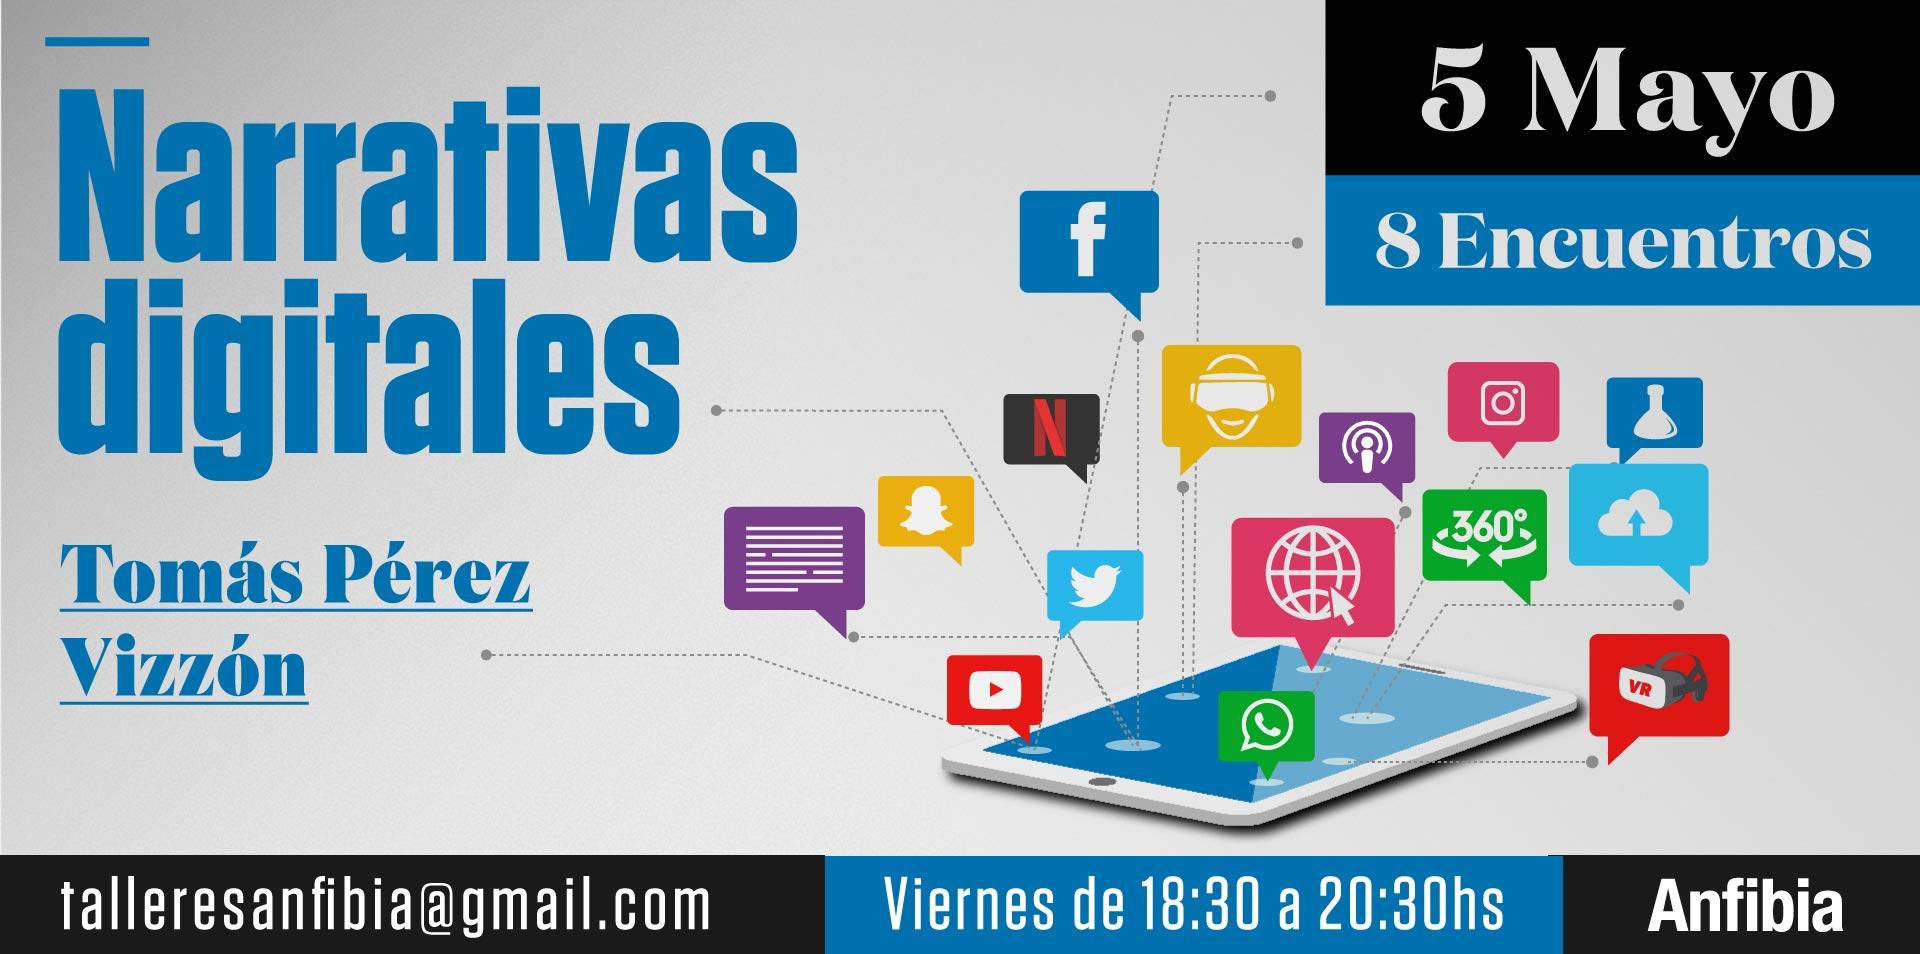 Flyer_Narrativas_Digitales